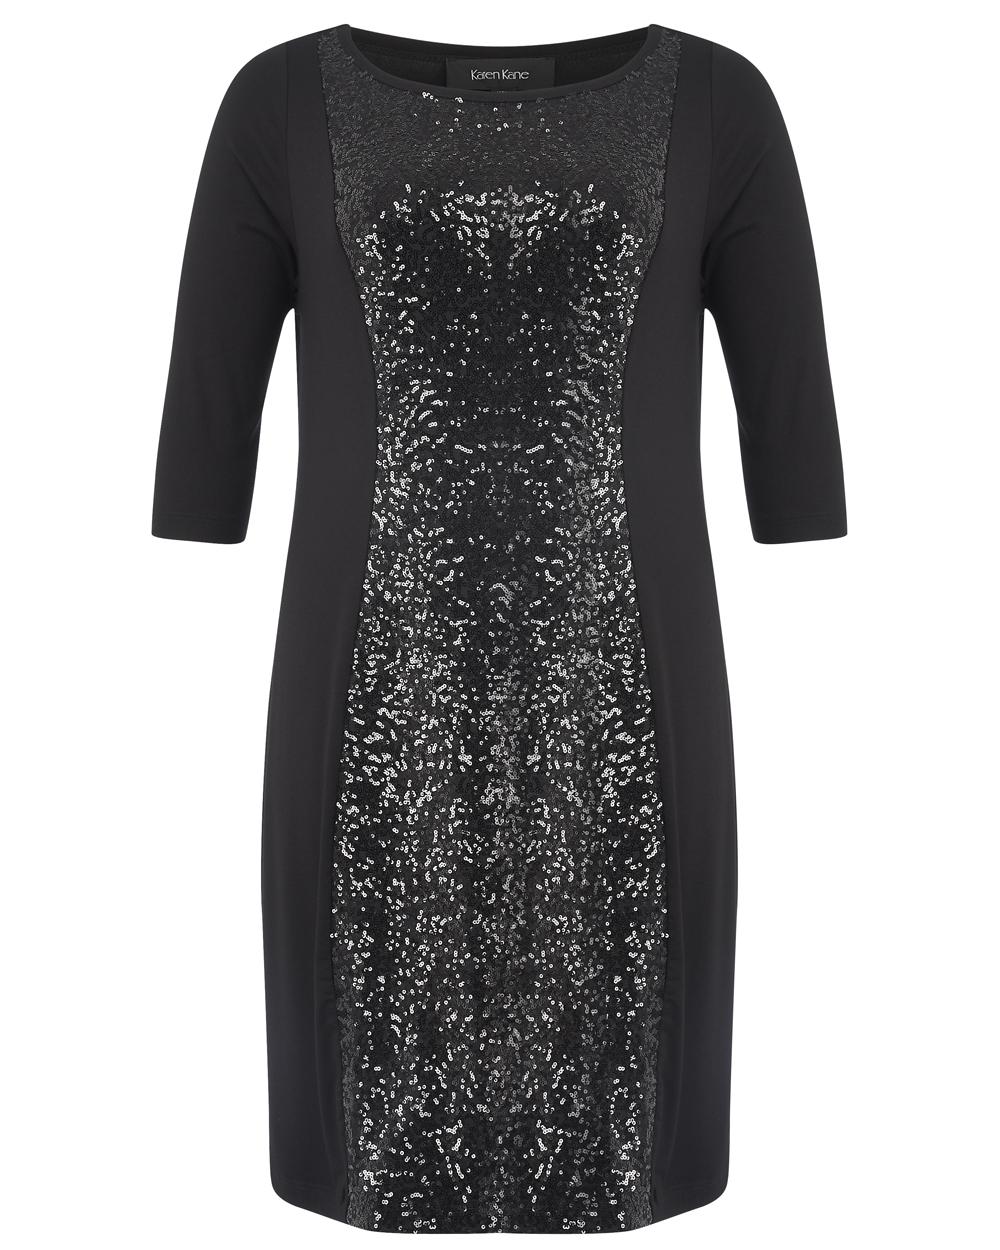 a70b5da1 Sequin Panel Dress SLiNK Boutique – SLiNK Magazine